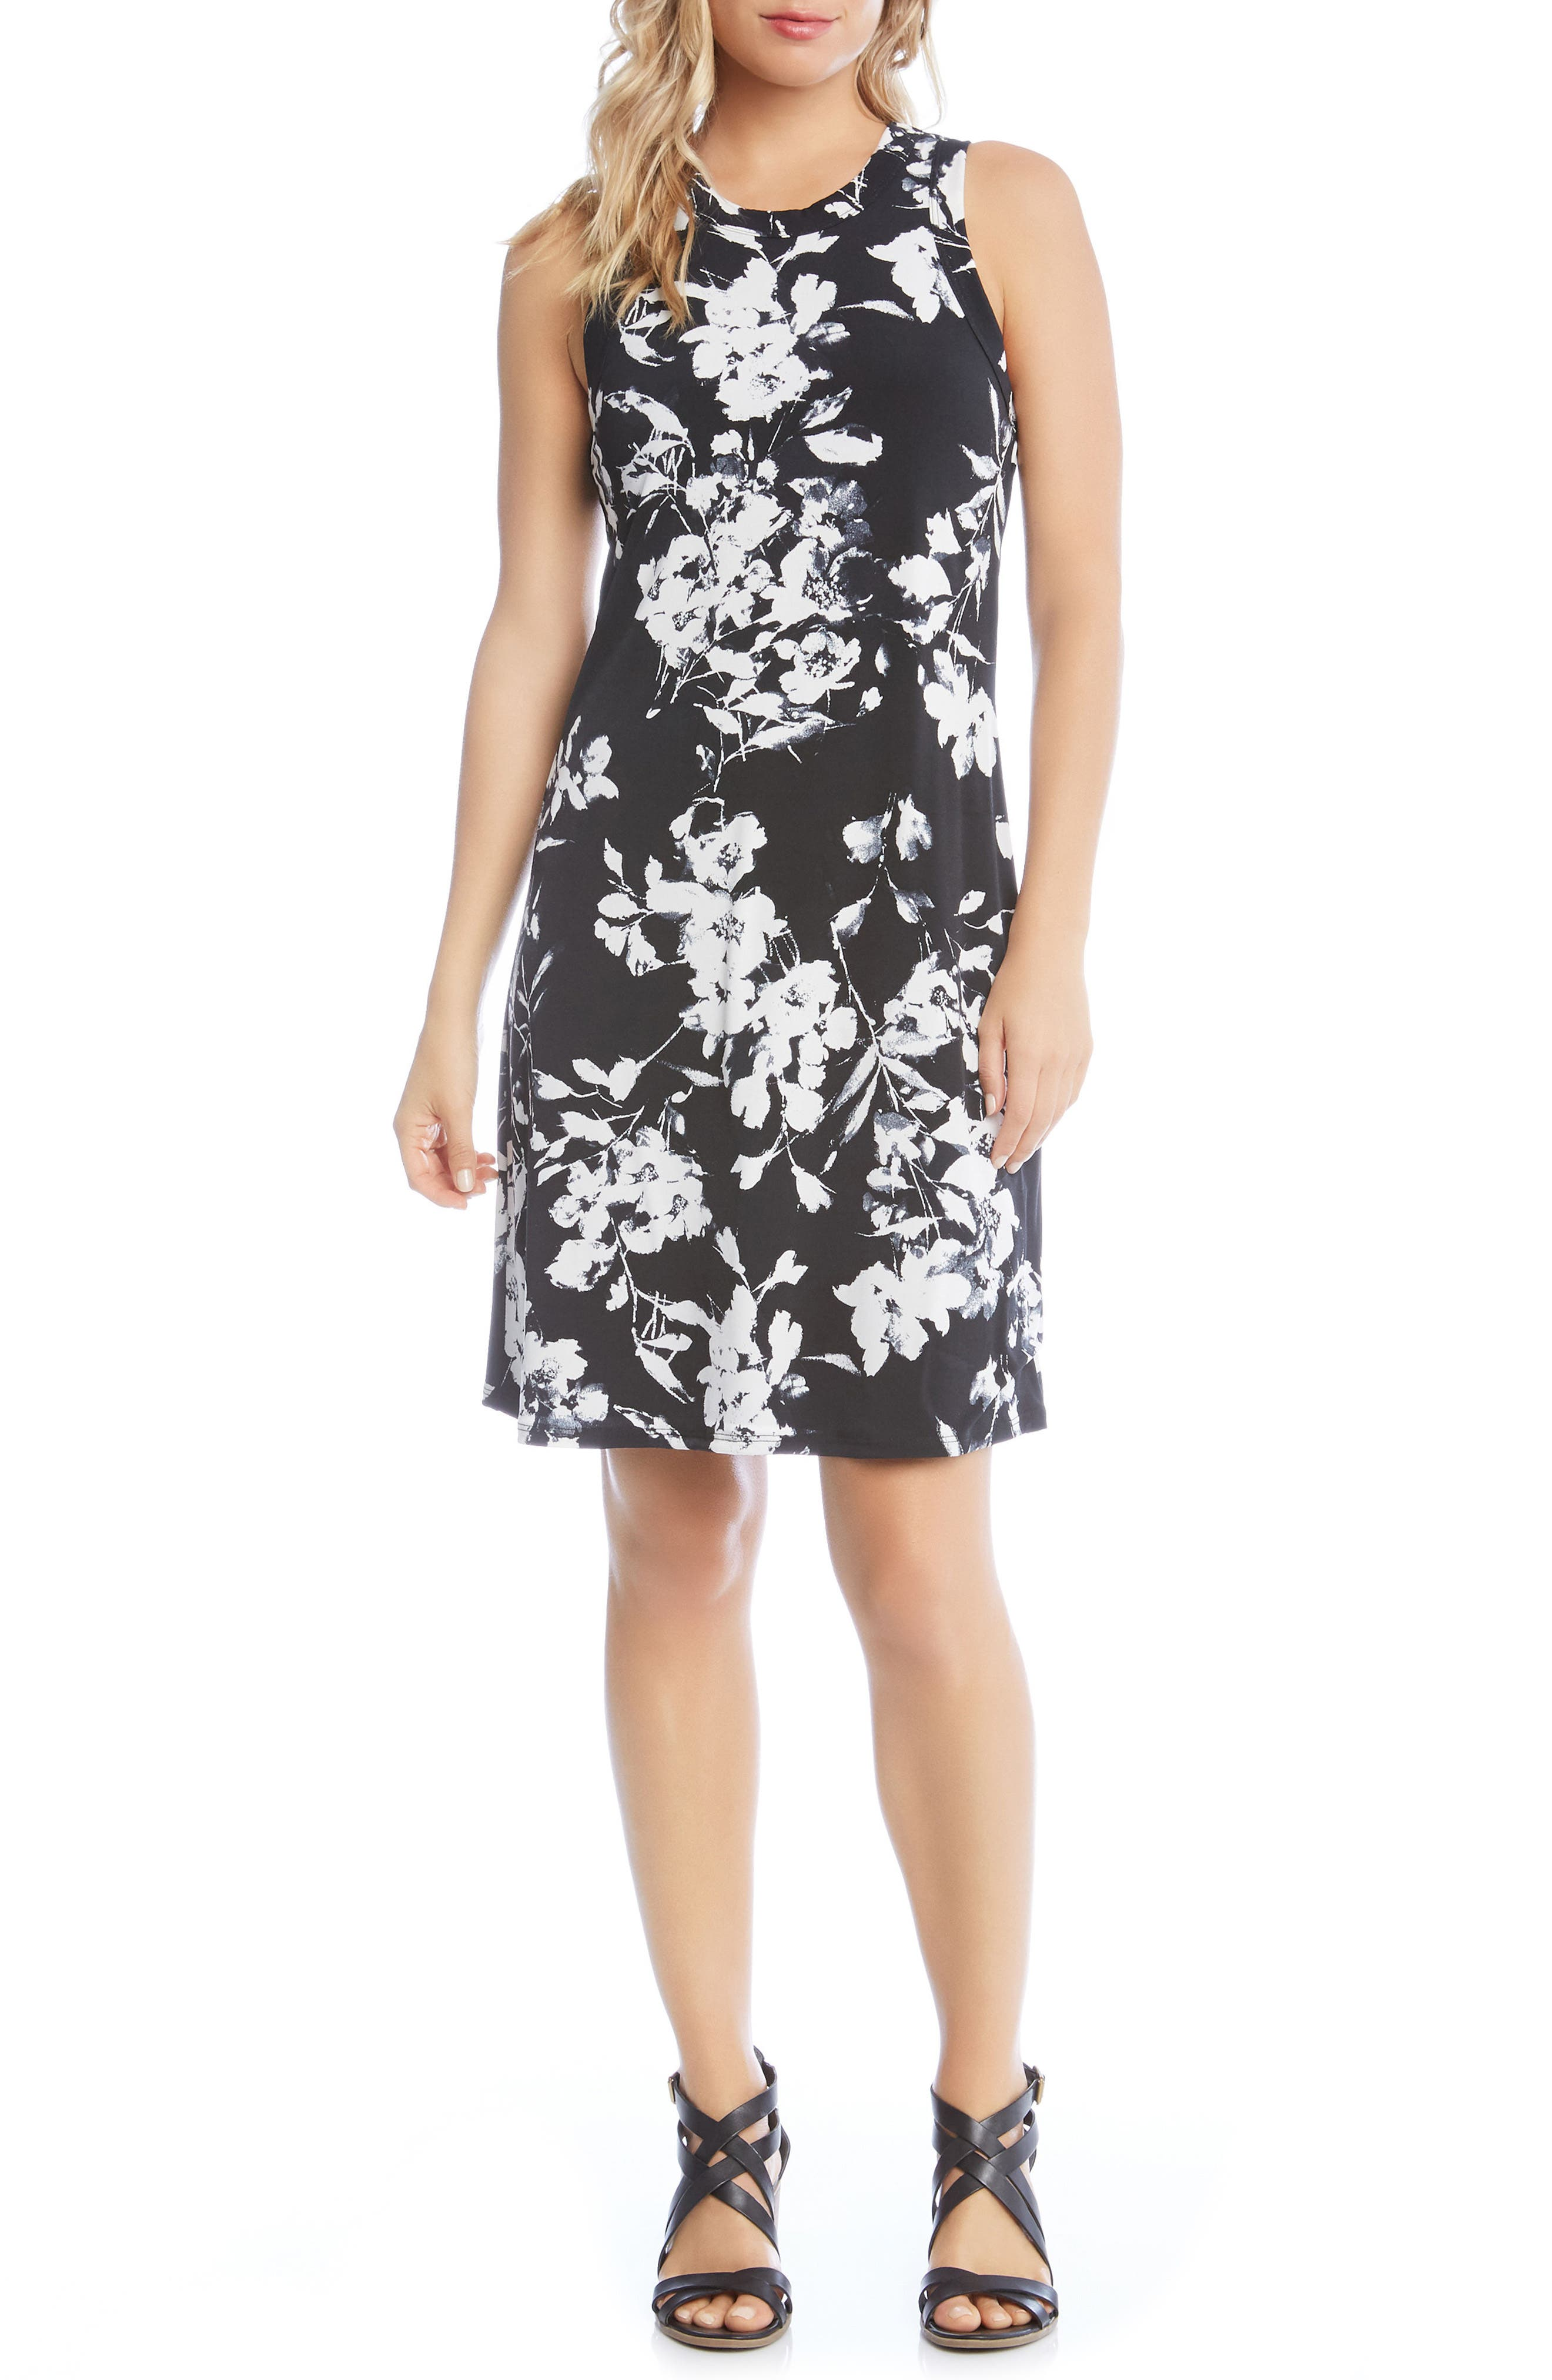 Floral Print Knit Dress,                             Main thumbnail 1, color,                             Black/ Off White